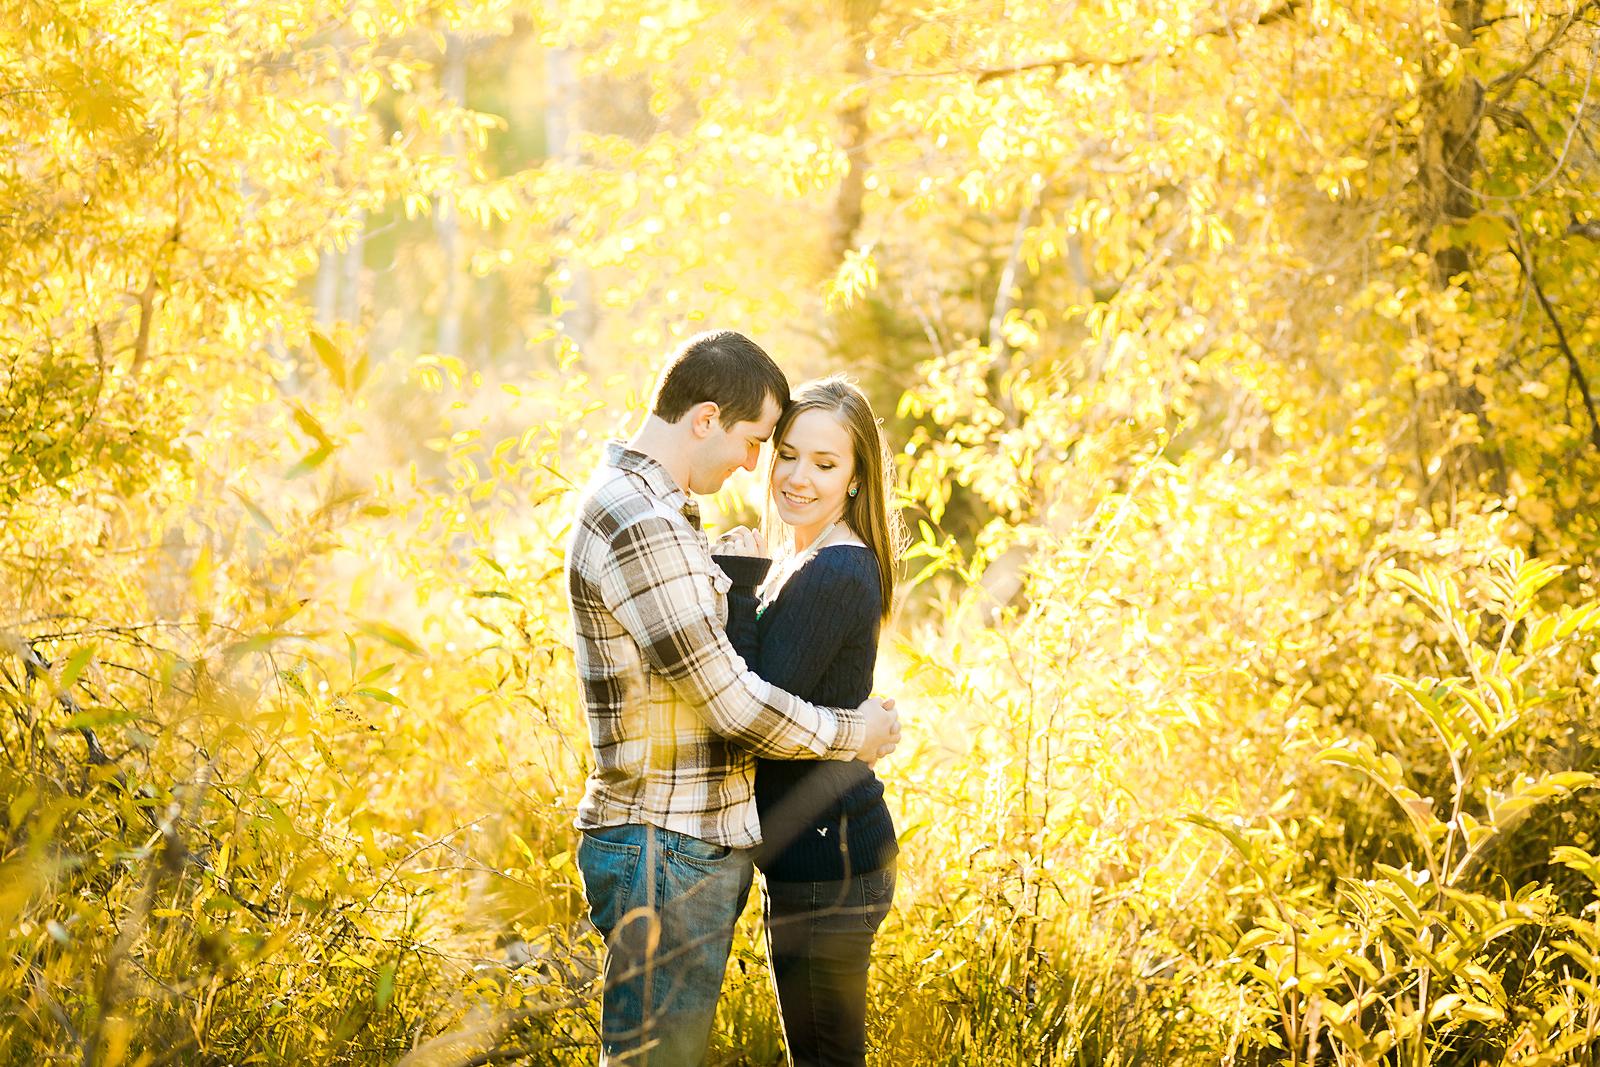 minneapolis_fall_engagement_photography_003.jpg